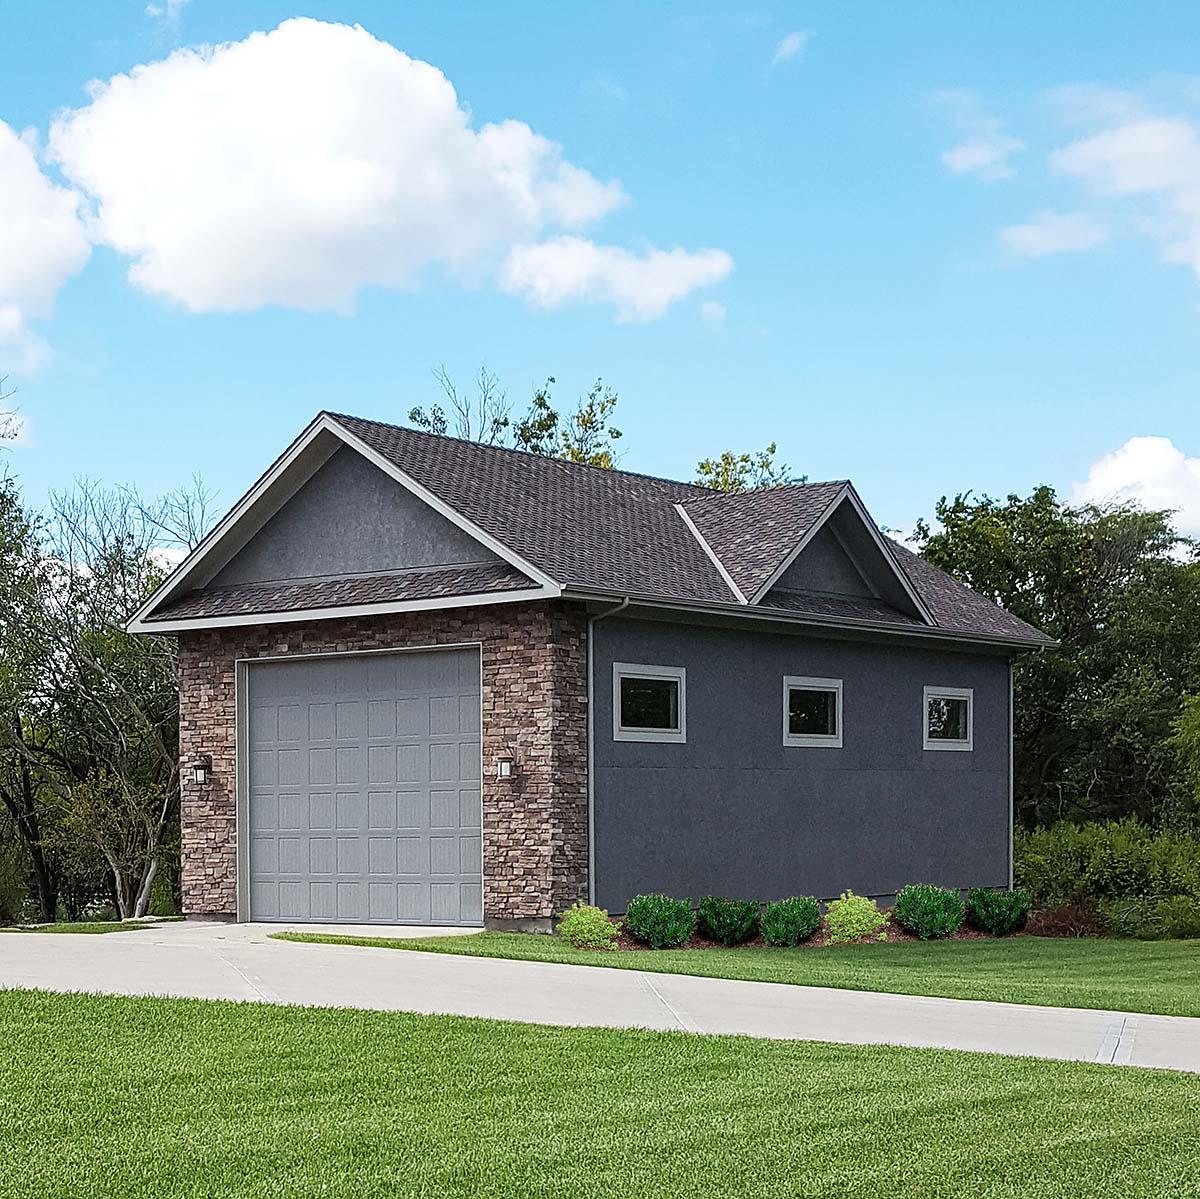 Traditional 1 Car Garage Plan 60676, RV Storage Elevation